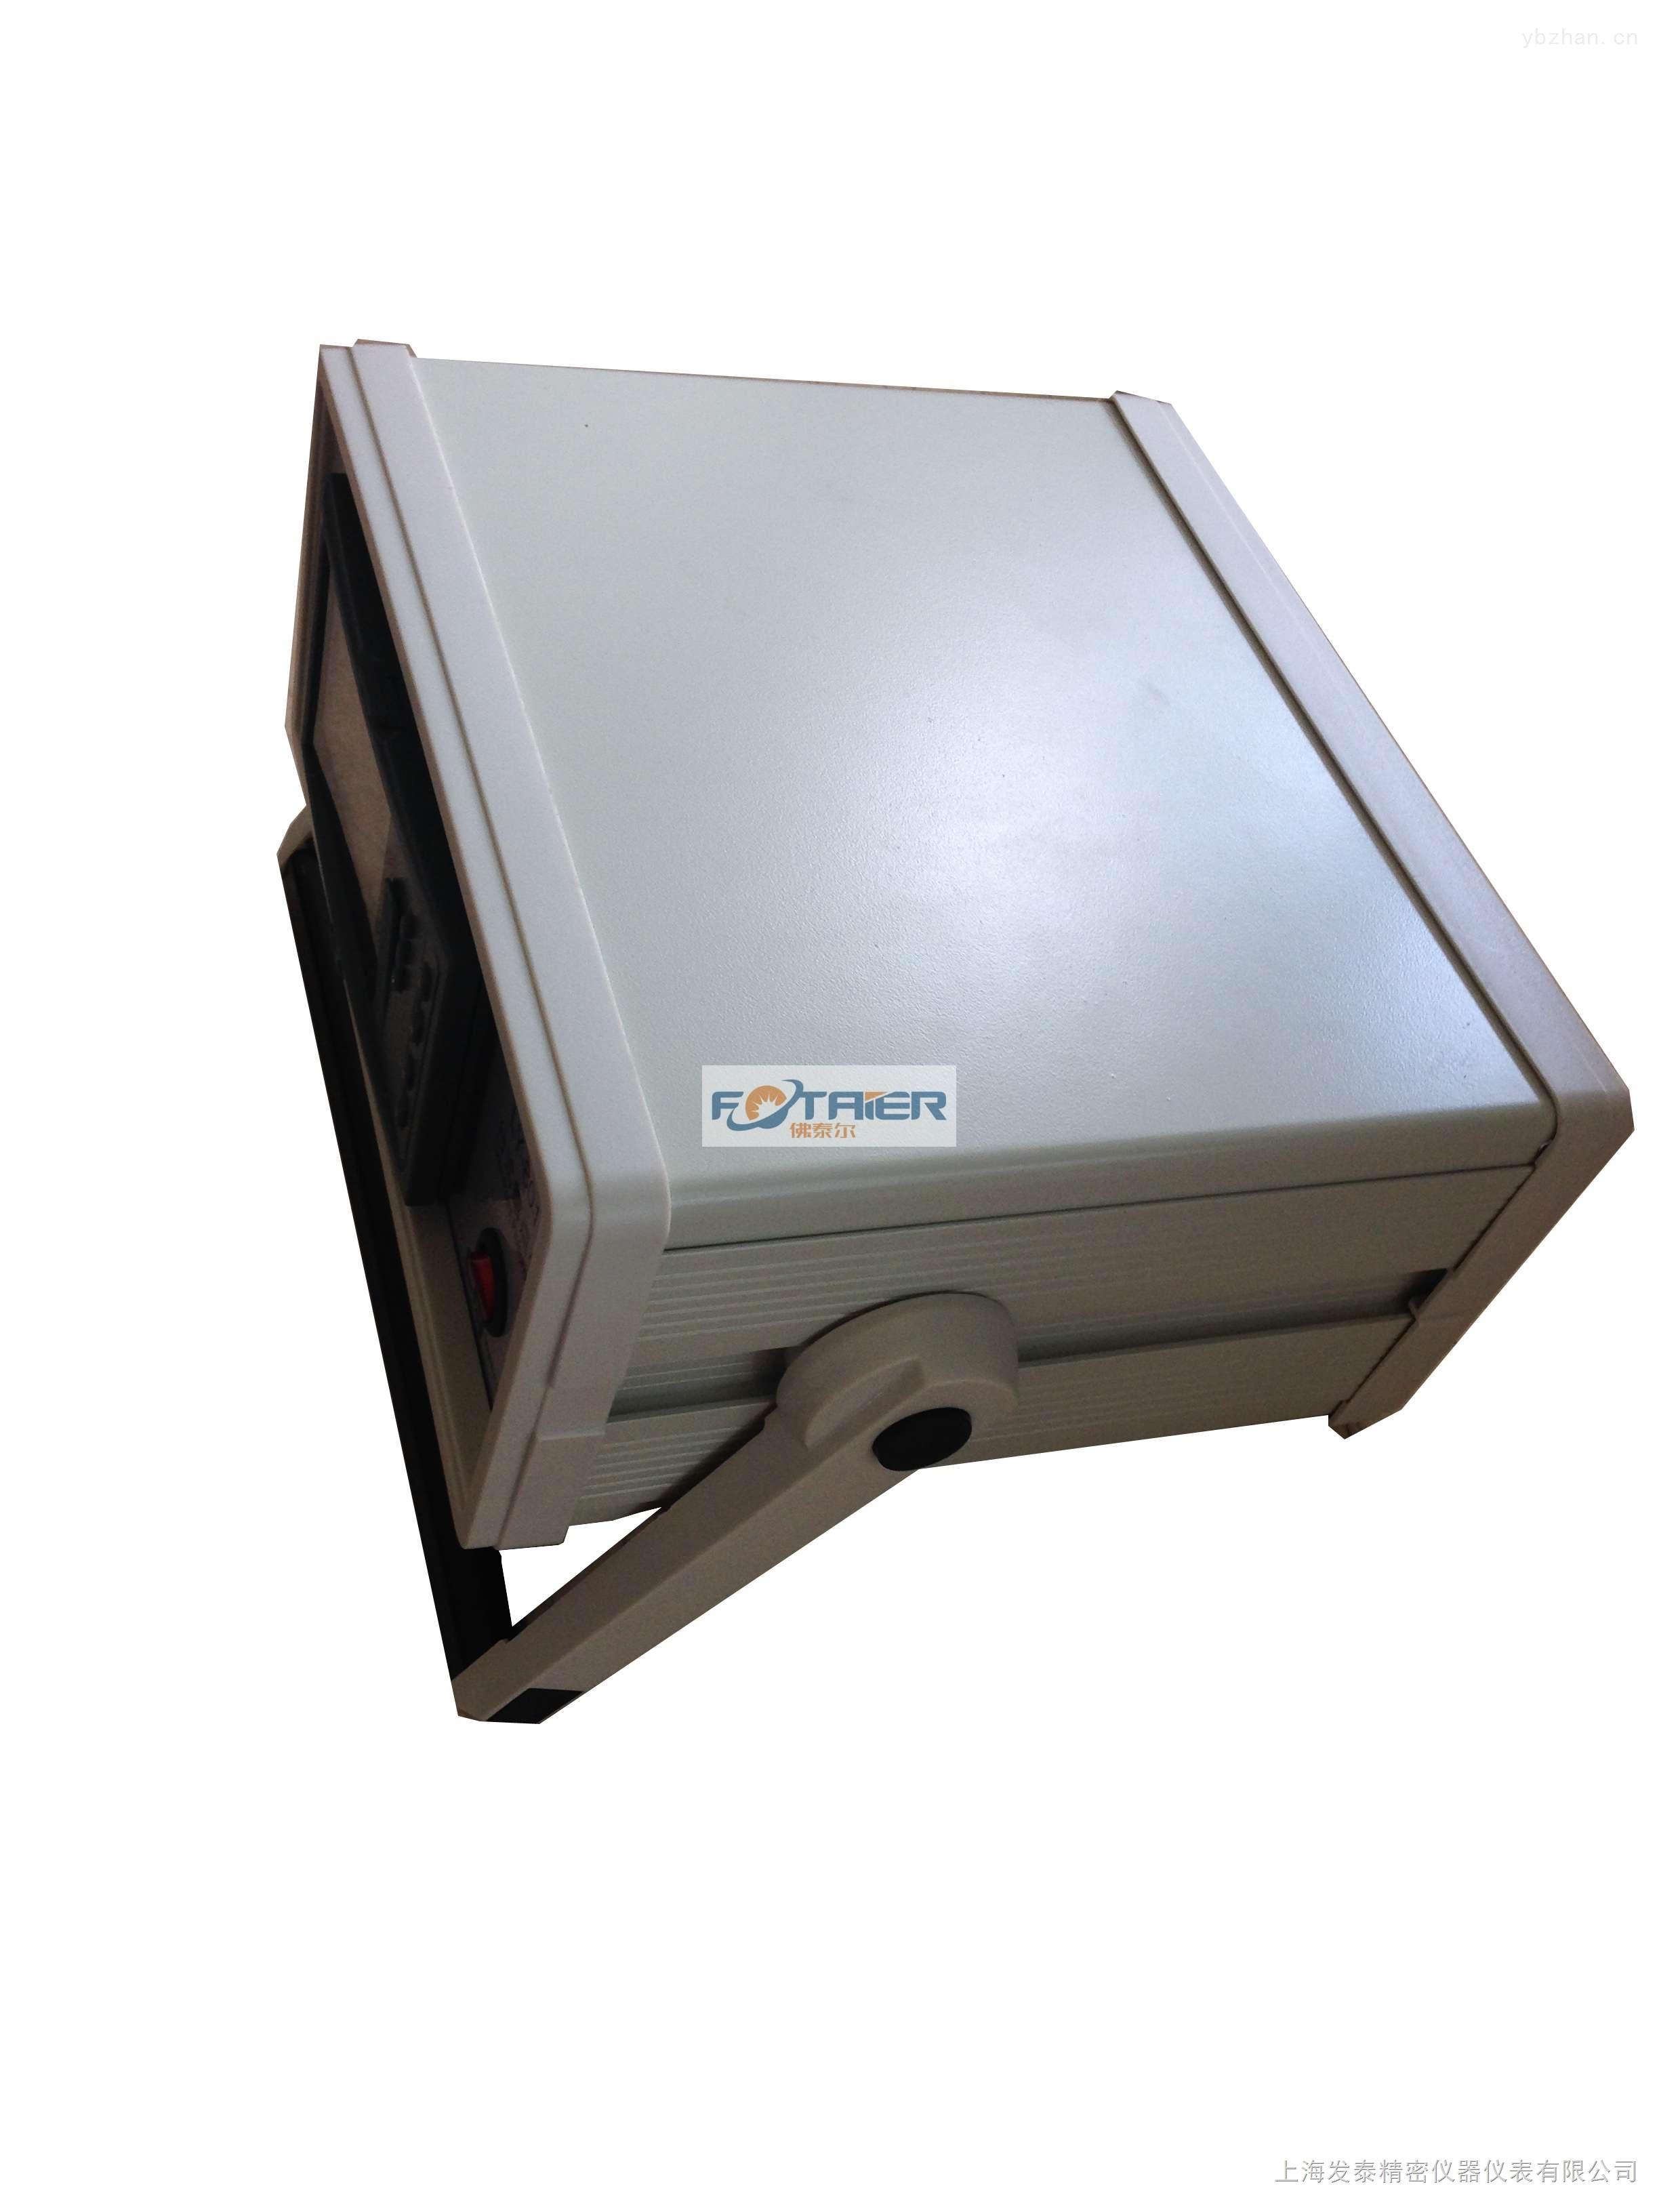 FT80-1X/FT80-2X-供應臺式精密在線露點儀(-80~+20℃